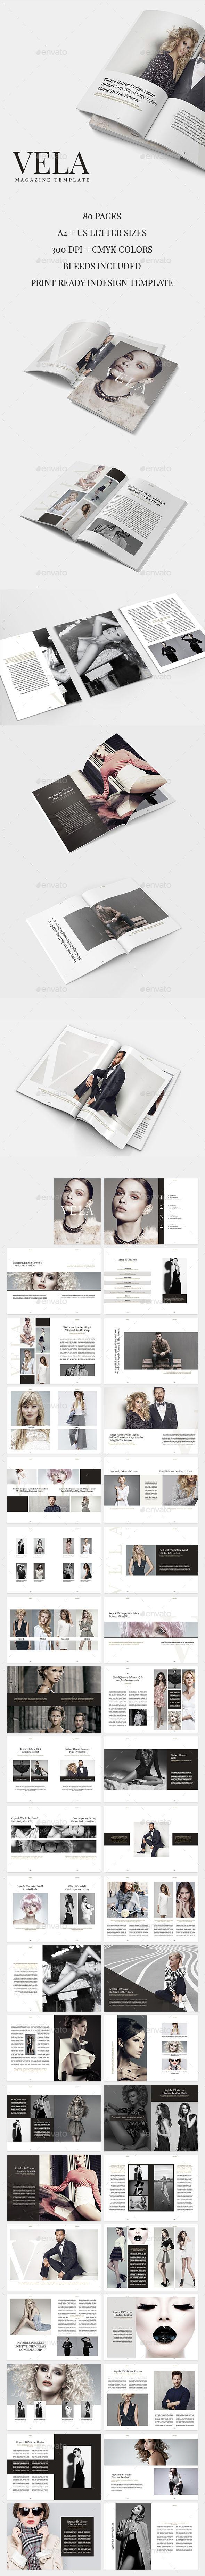 Vela Magazine Template - Magazines Print Templates